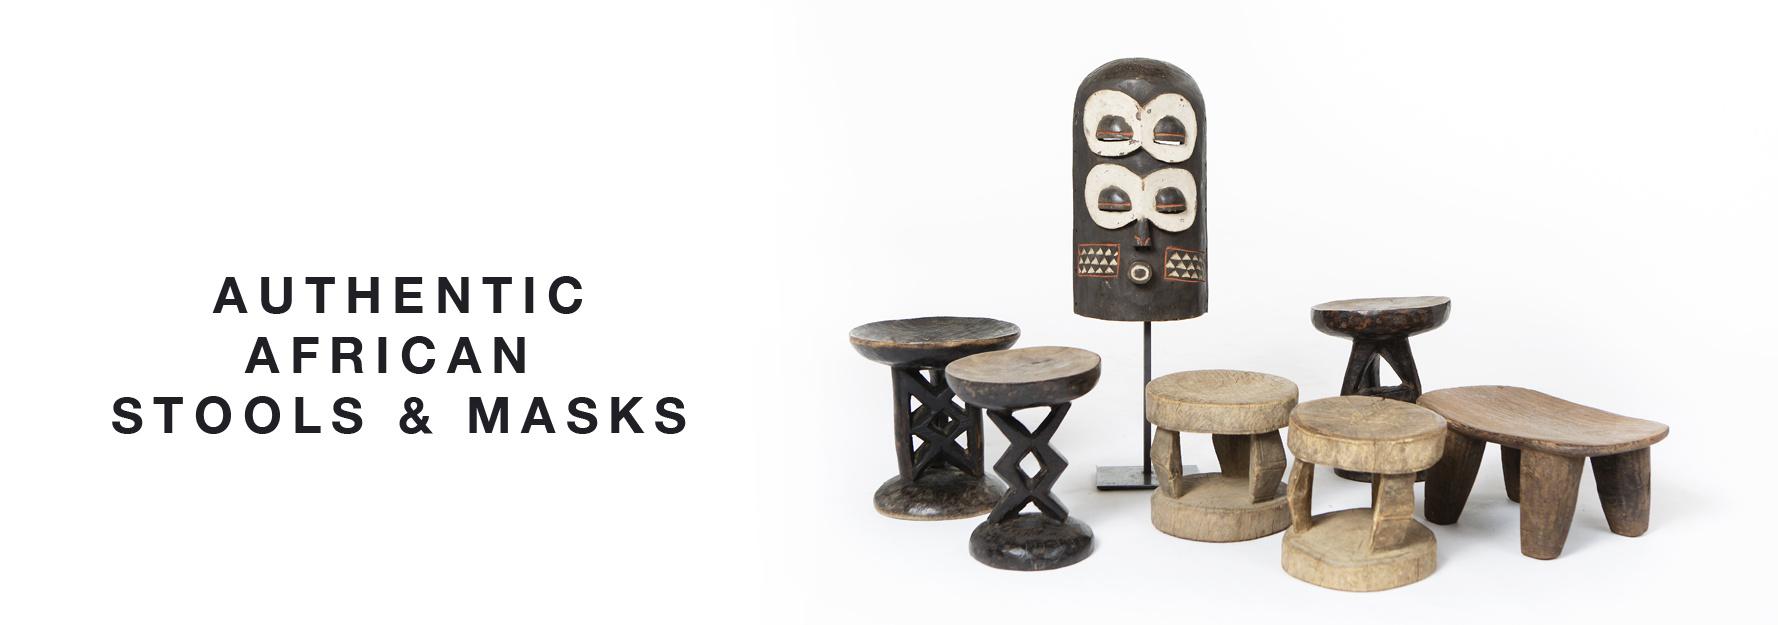 African stools & masks